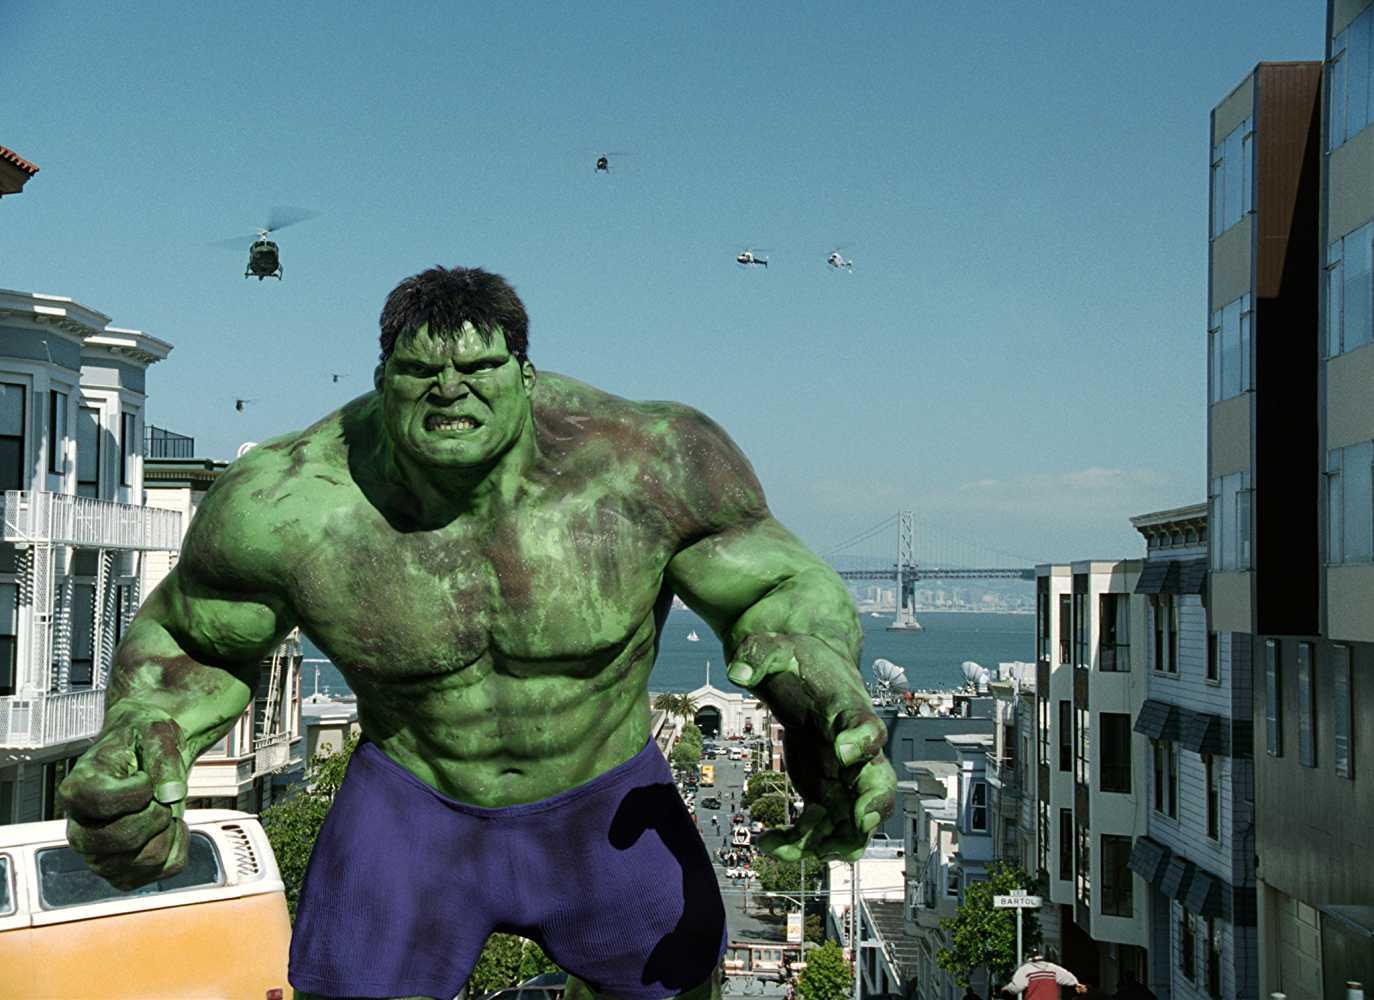 Hulk 2003 Full Movie Download Dual Audio 480p Bdrip 500mb